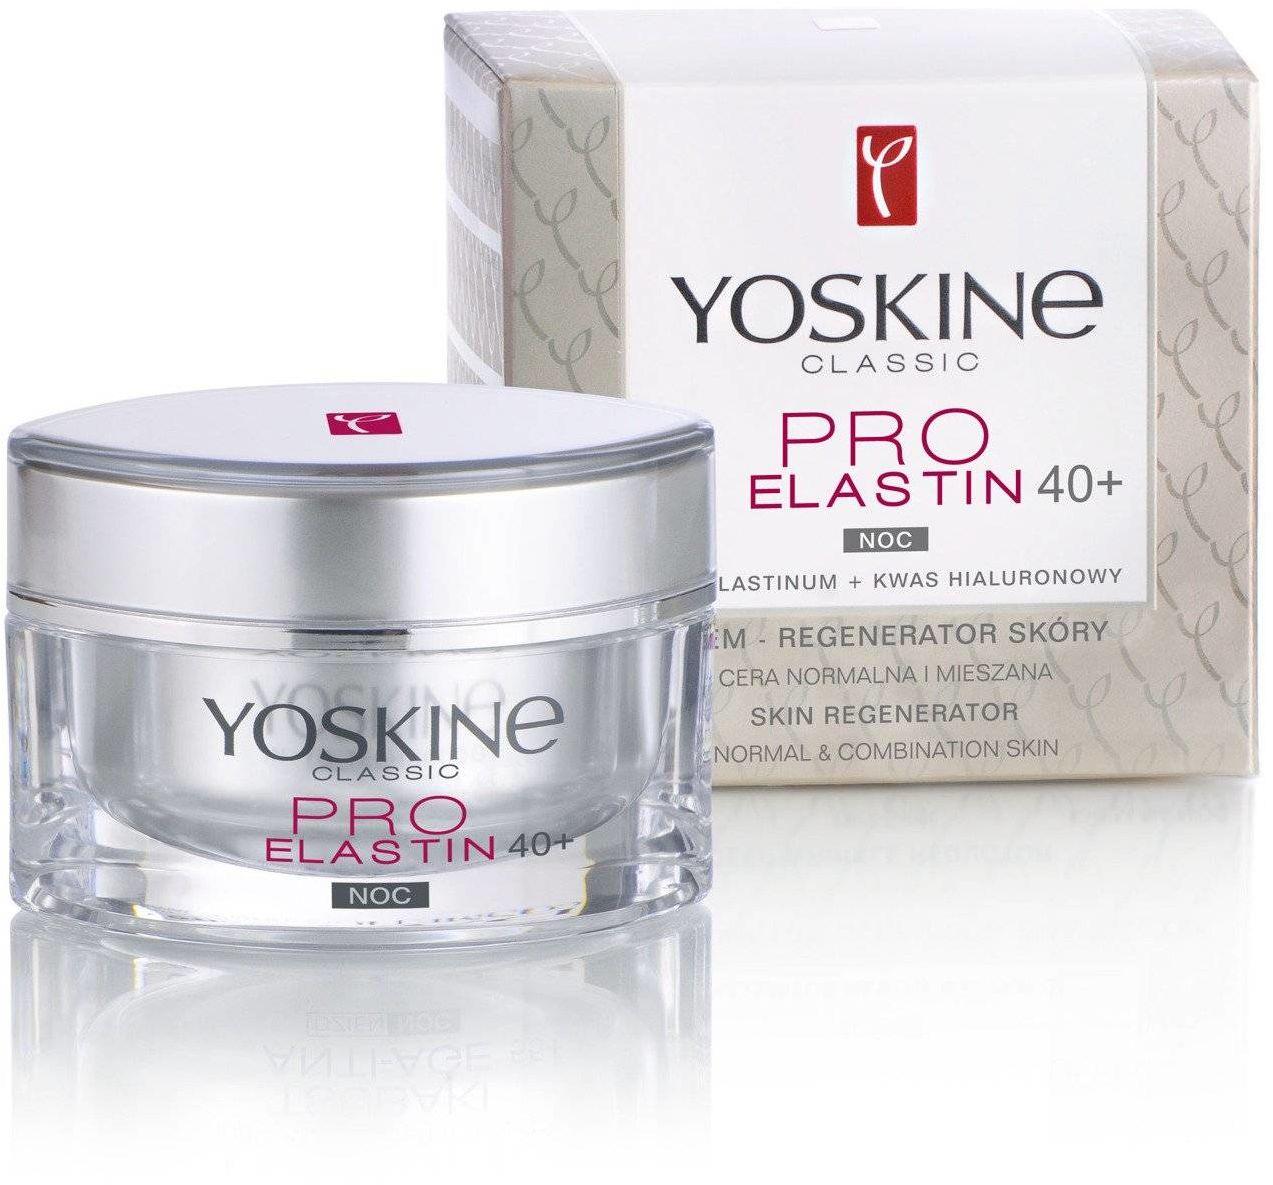 Yoskine Classic Pro Elastin 40+ Krem na noc 50ml